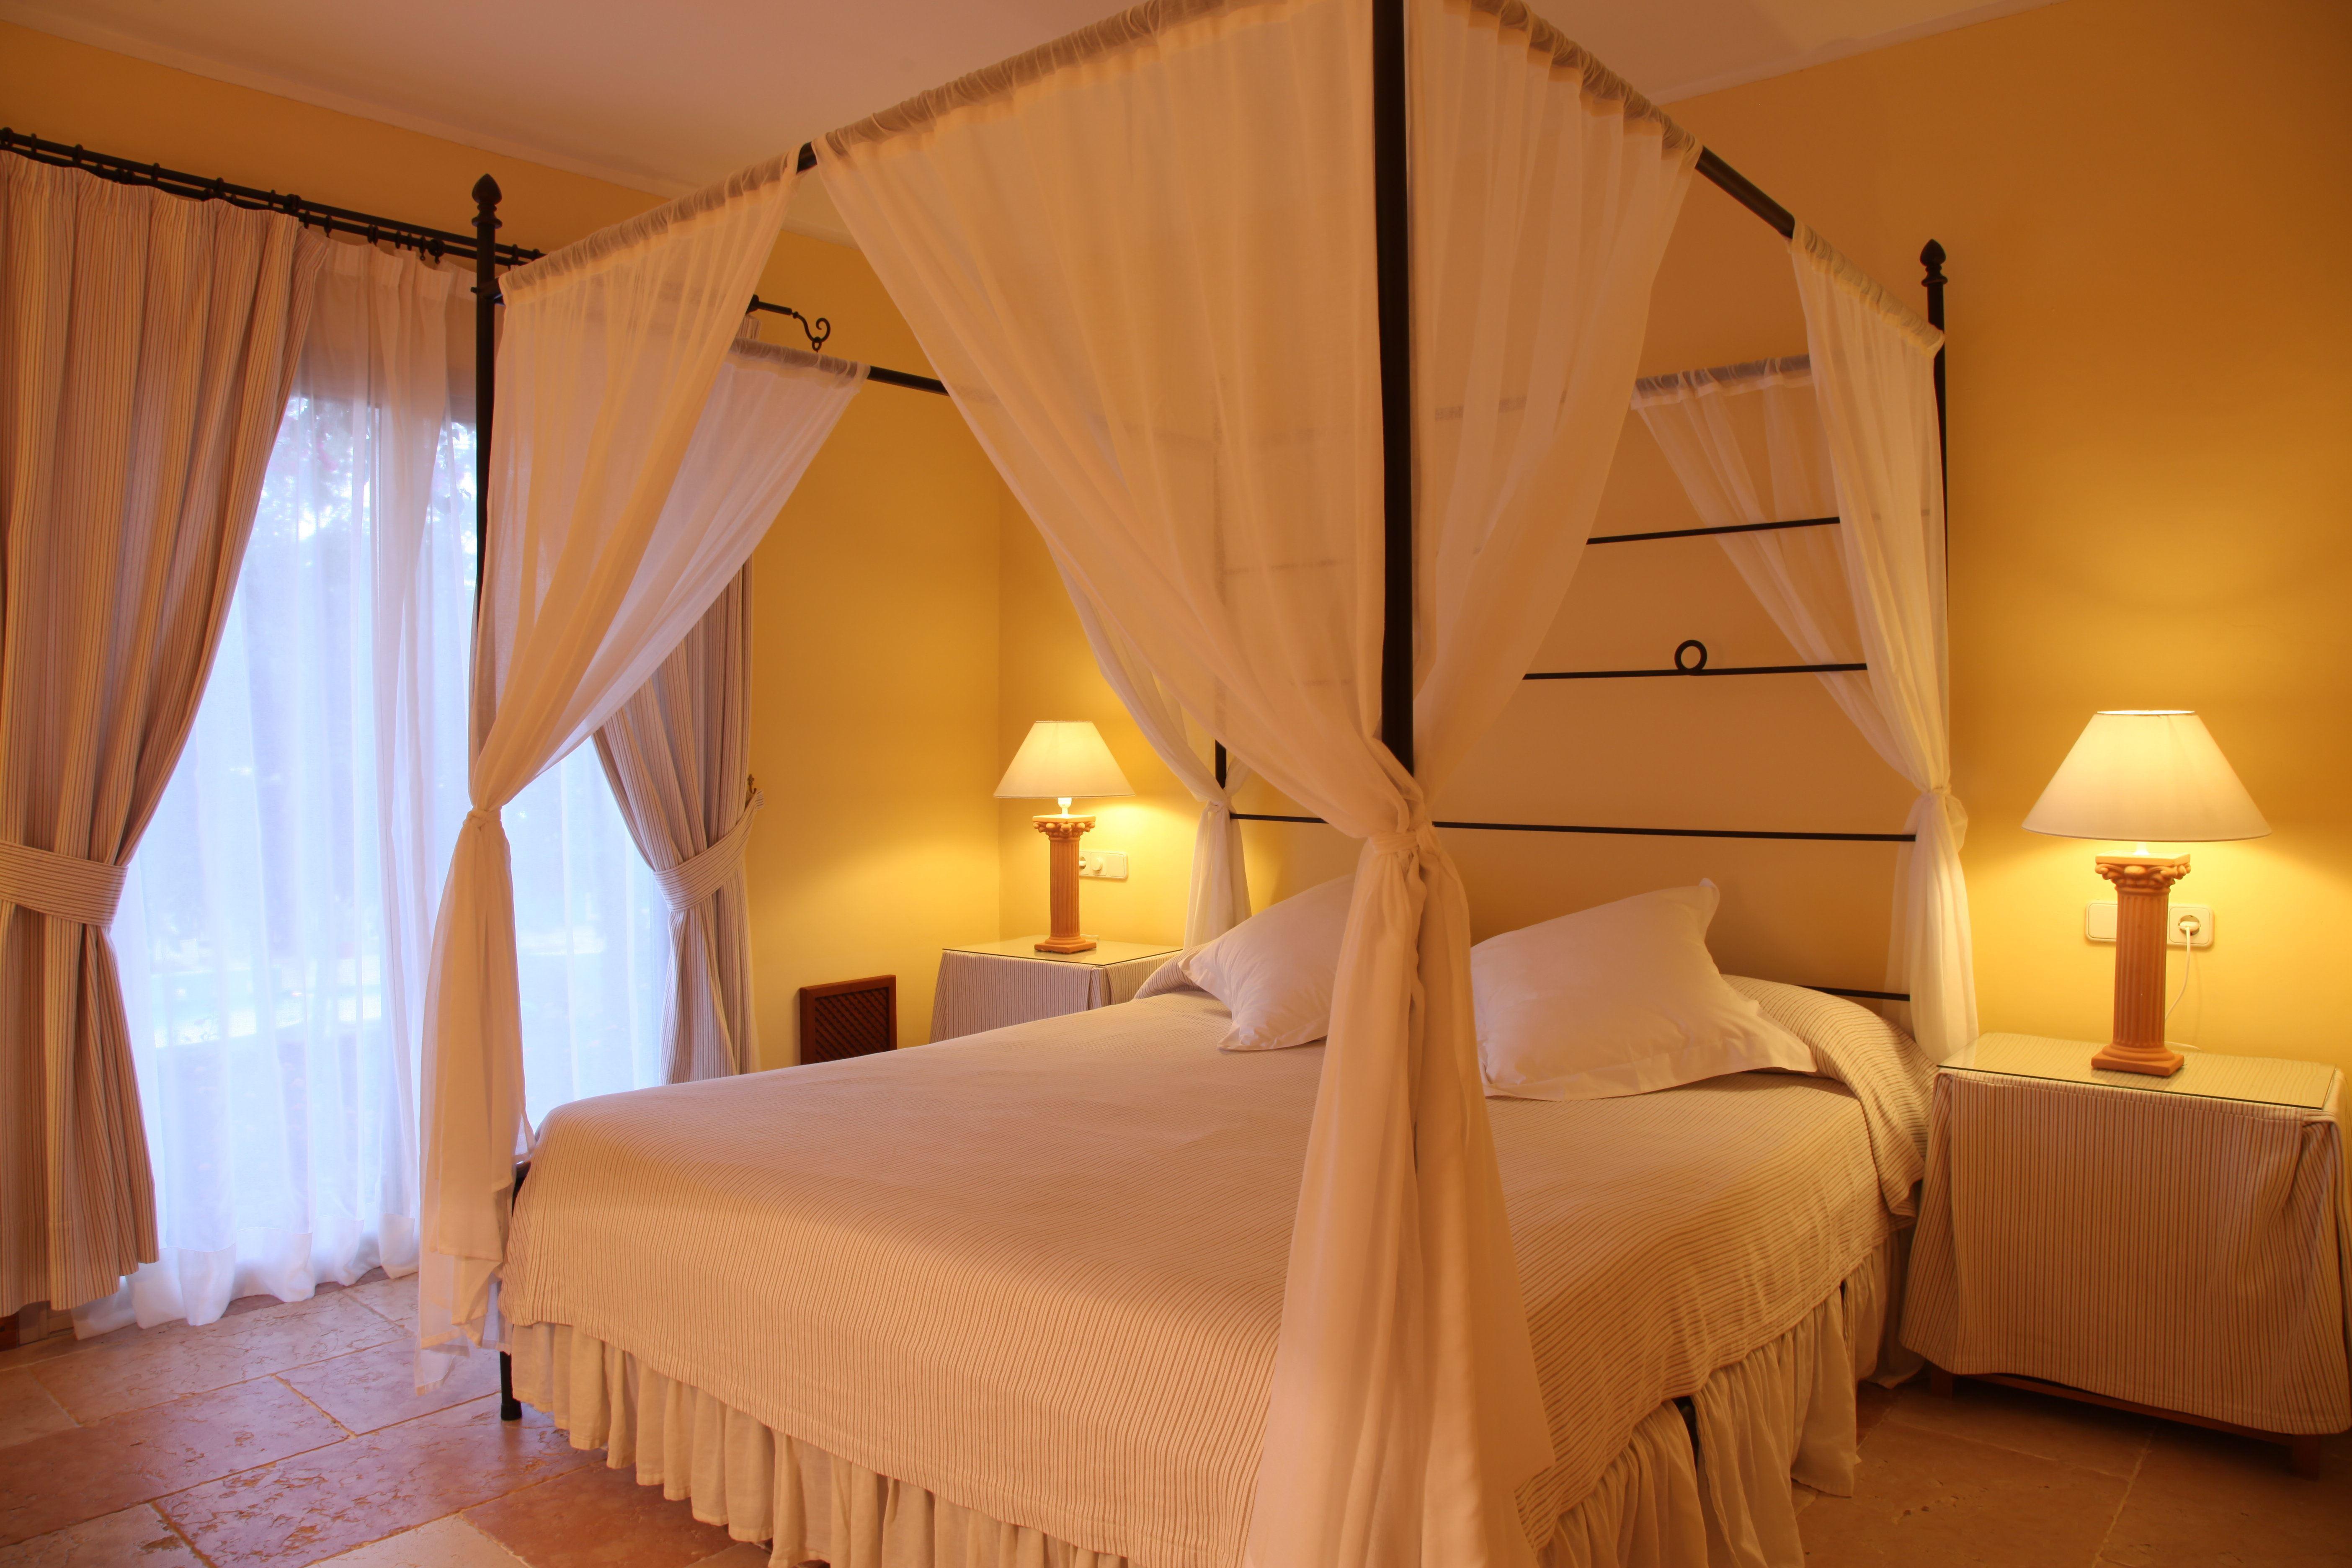 Superiorsvit, Pula Golf Resort, Son Servera, Mallorca, Signaturresor